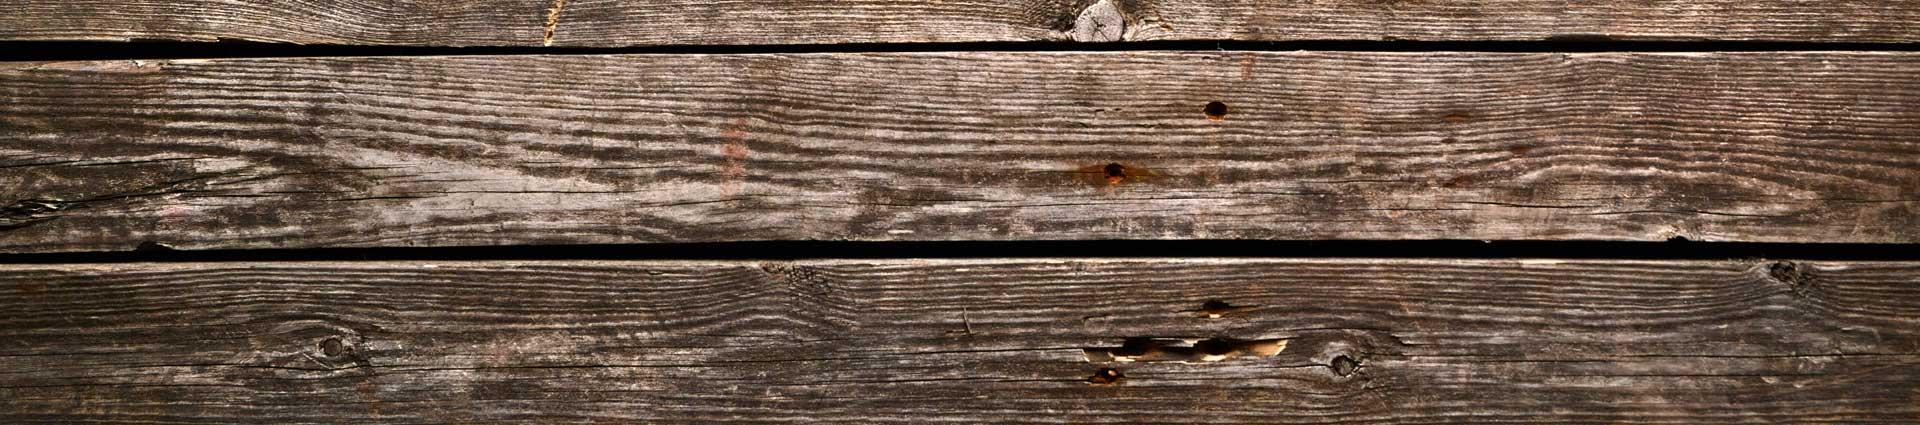 1920x425-wooden-bg